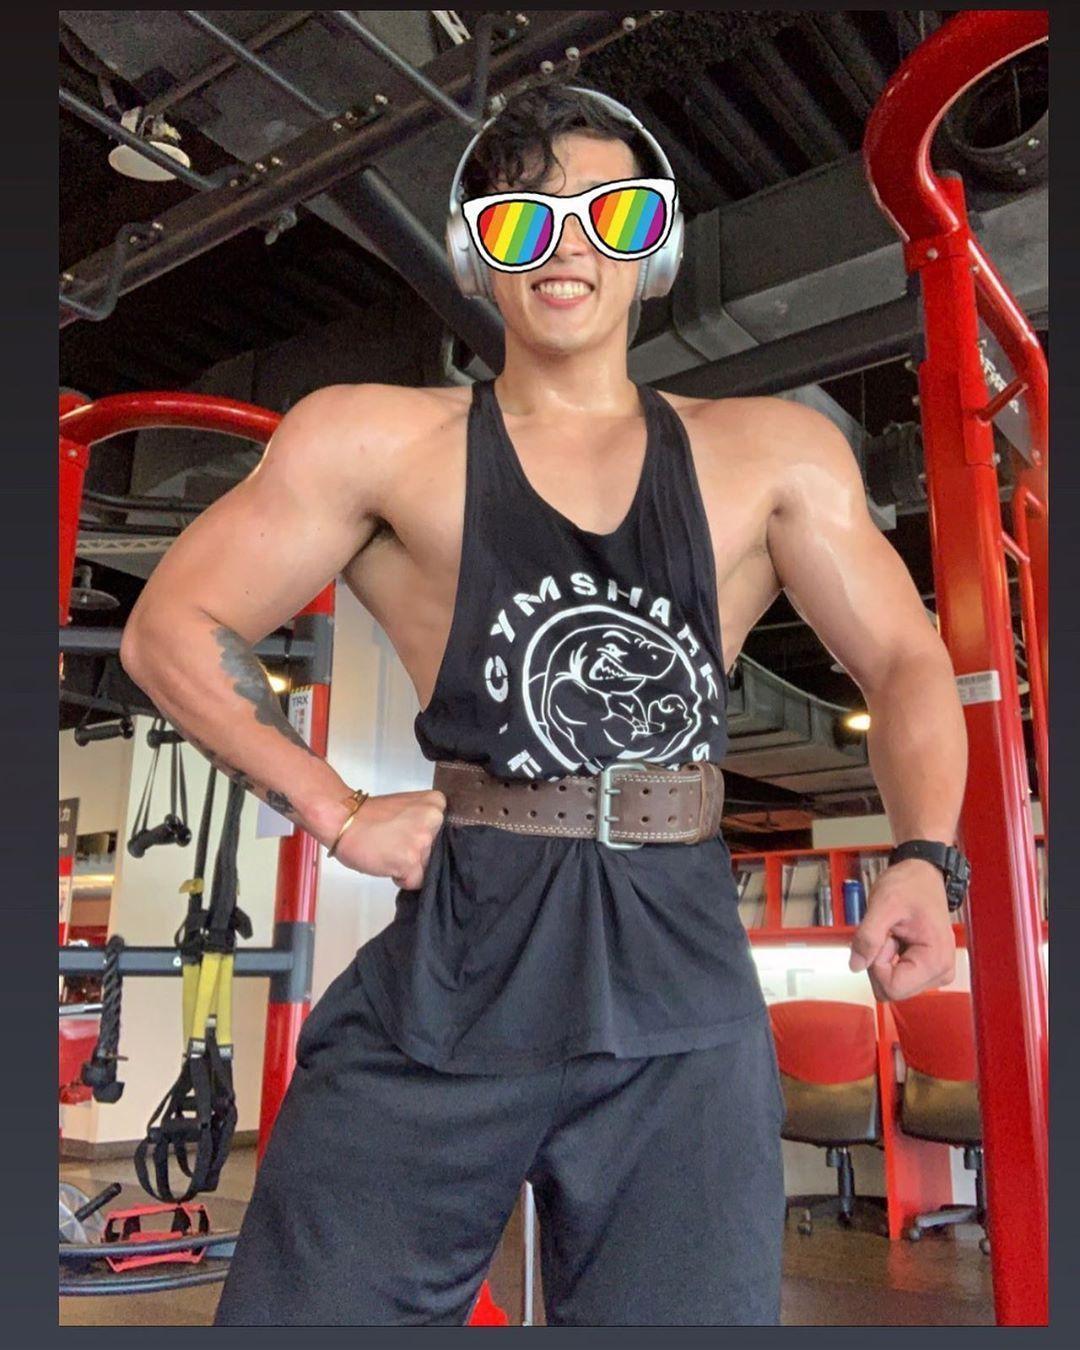 戰鬥模式開啟😤 #taiwan #fitness #mensphysique #bodybuilding #健身工廠 #德安廠 #私人教練 #減肥